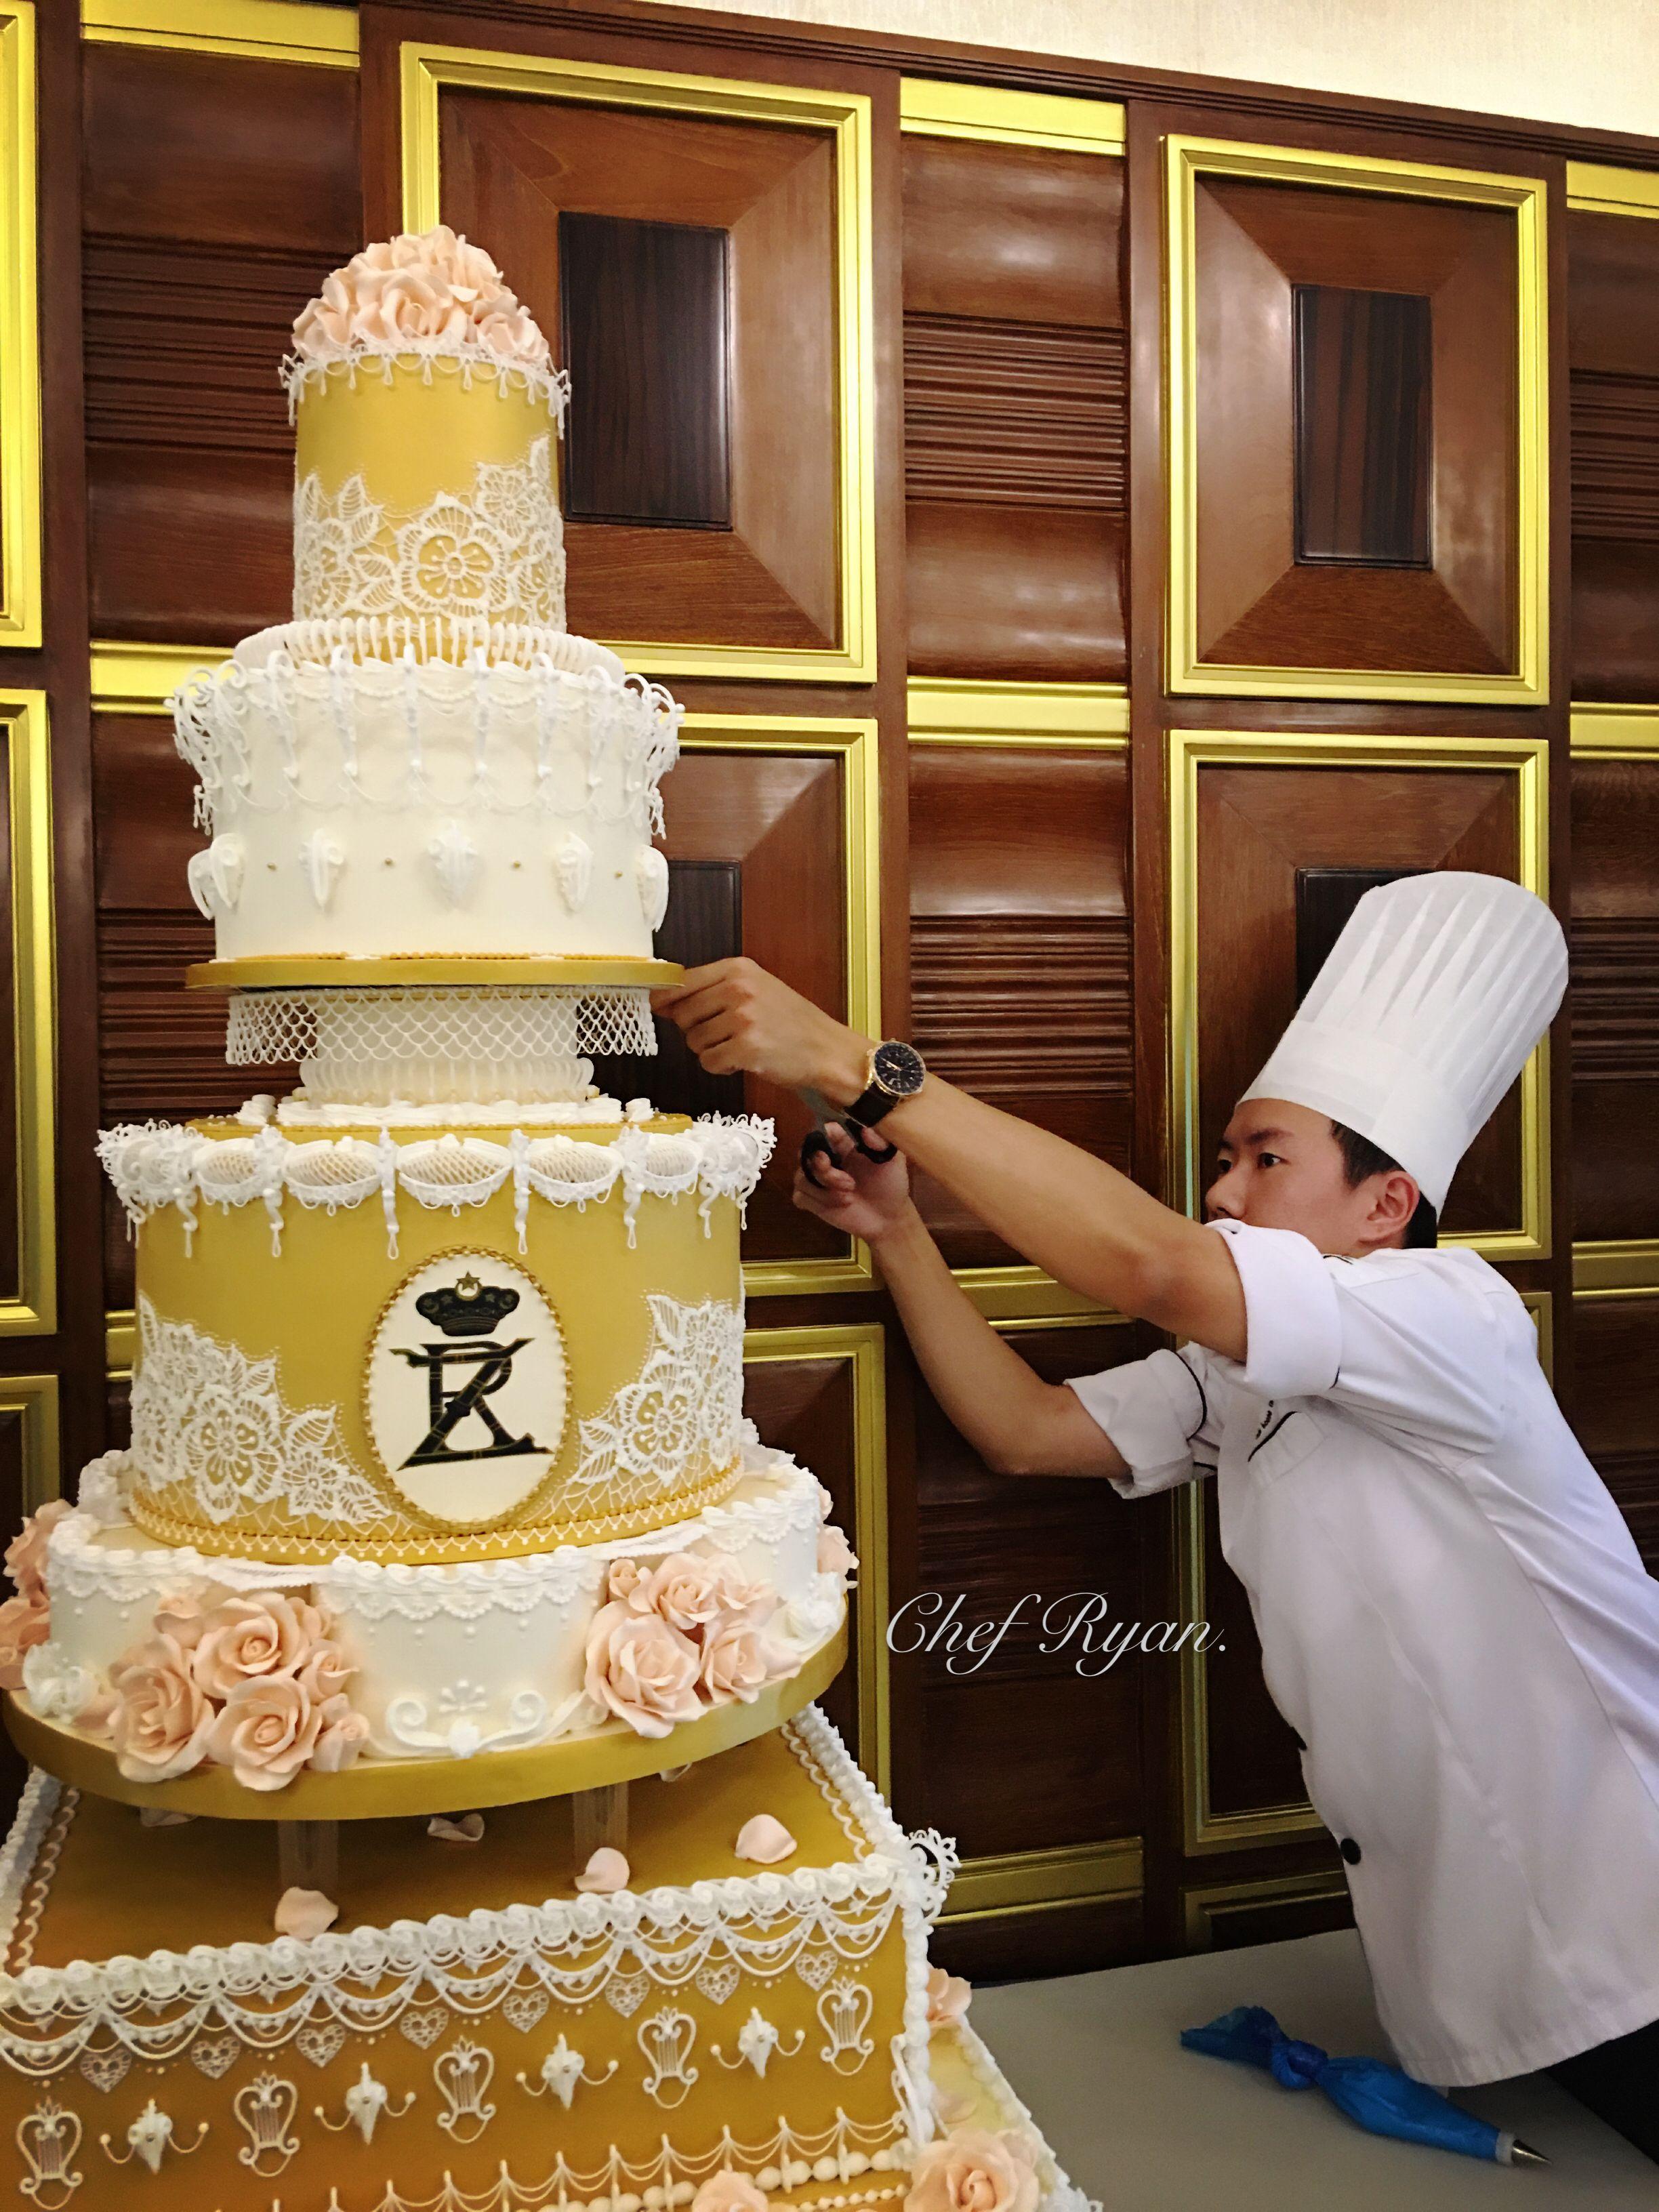 Tunku Aminah Johor Chef Ryan